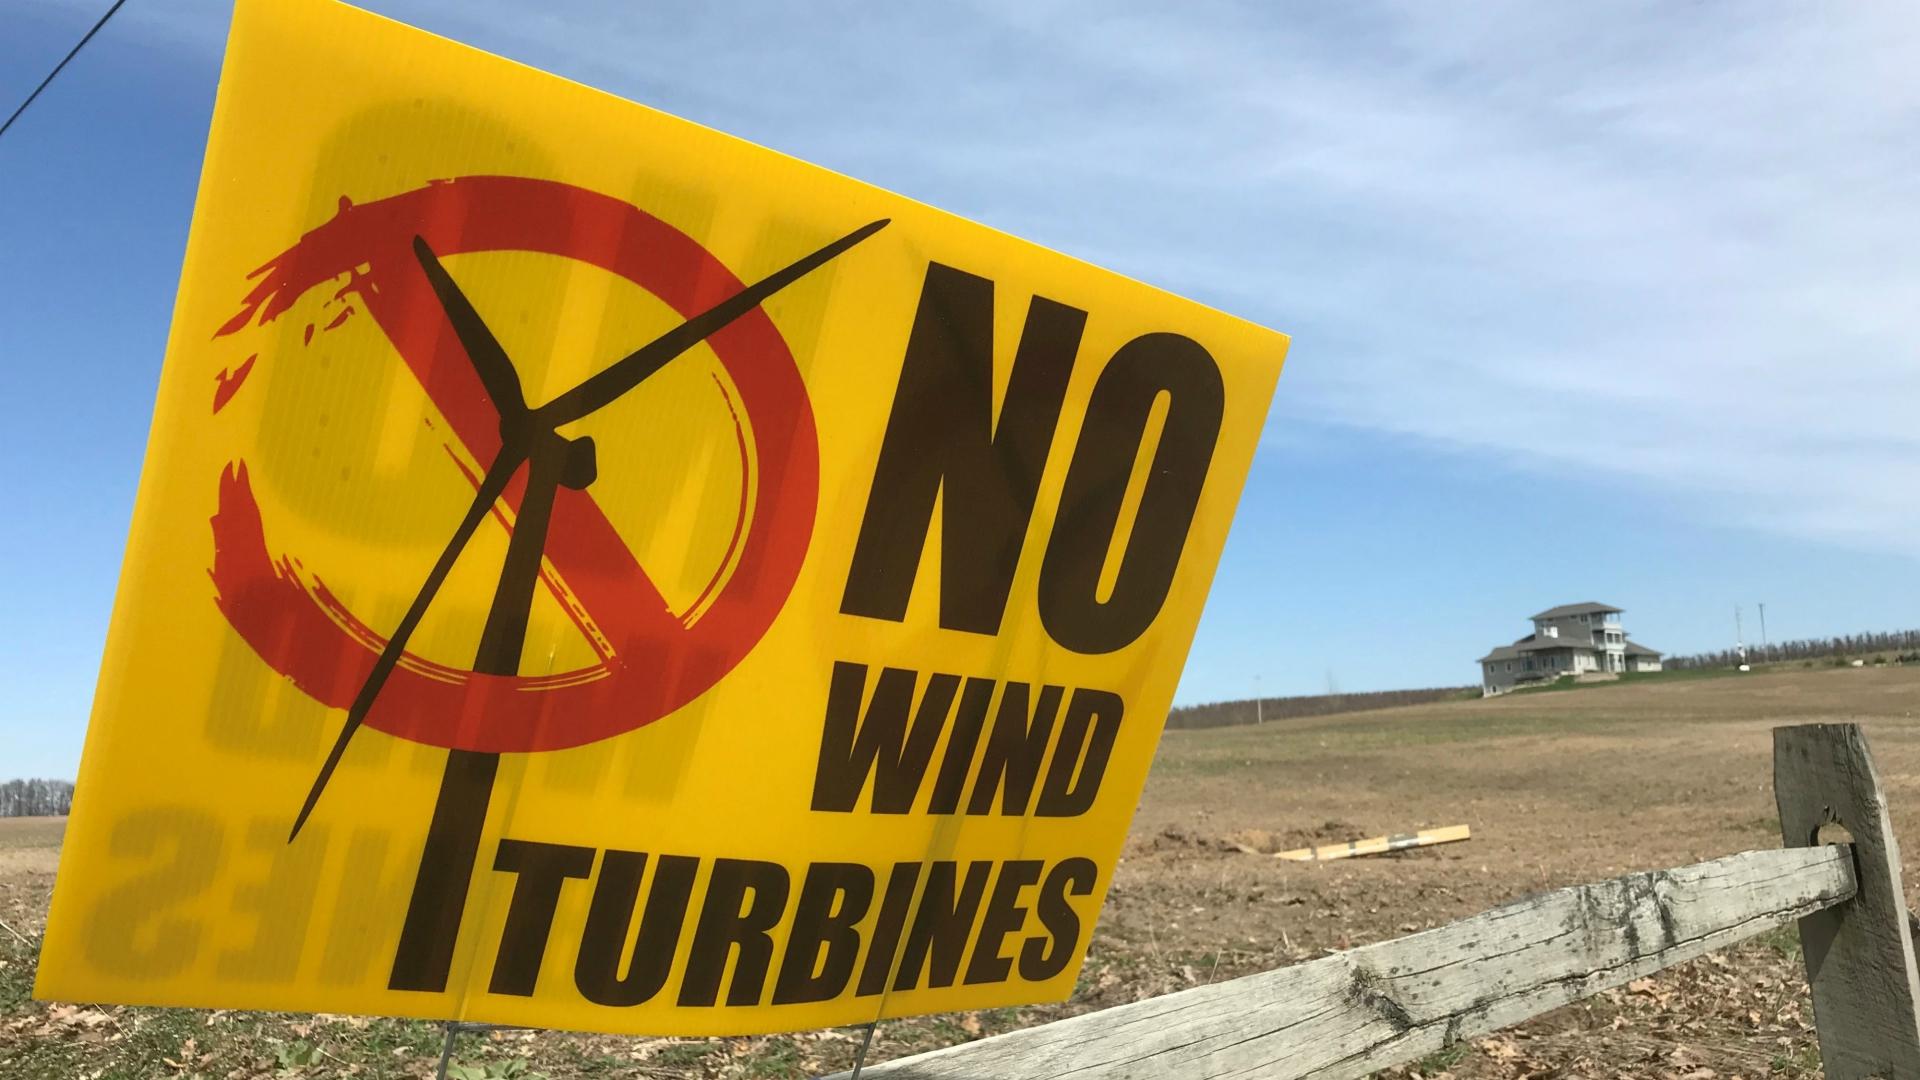 casnovia township no wind turbines sign 042419_1556135172344.jpg.jpg